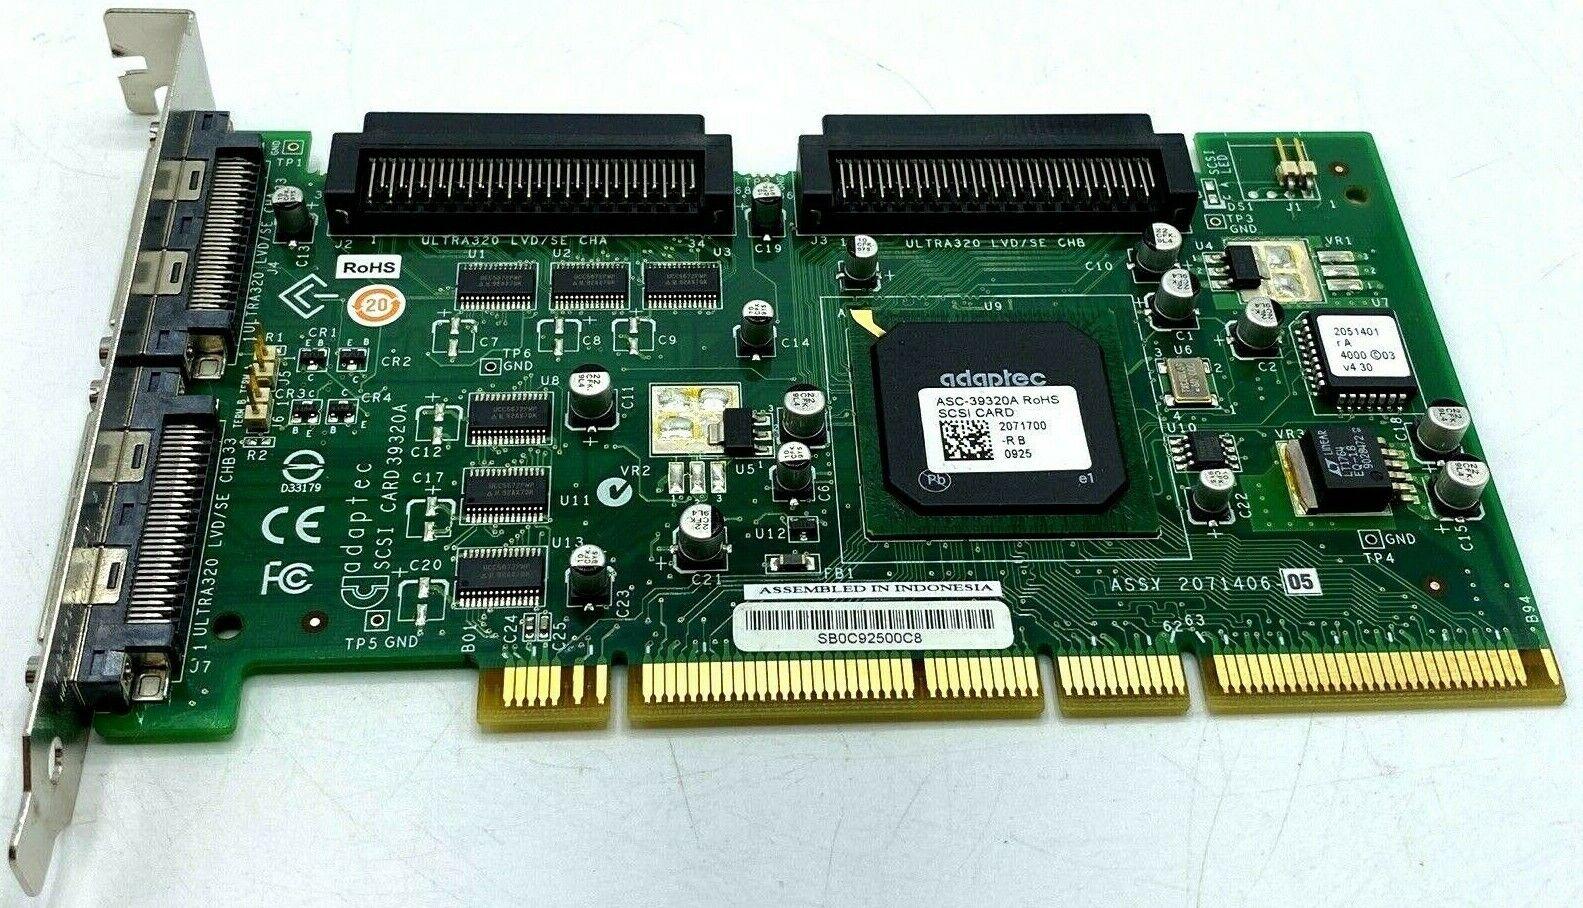 DELL ADAPTEC 39320A SCSI CONTROLLER CARD Computers & Accessories ...